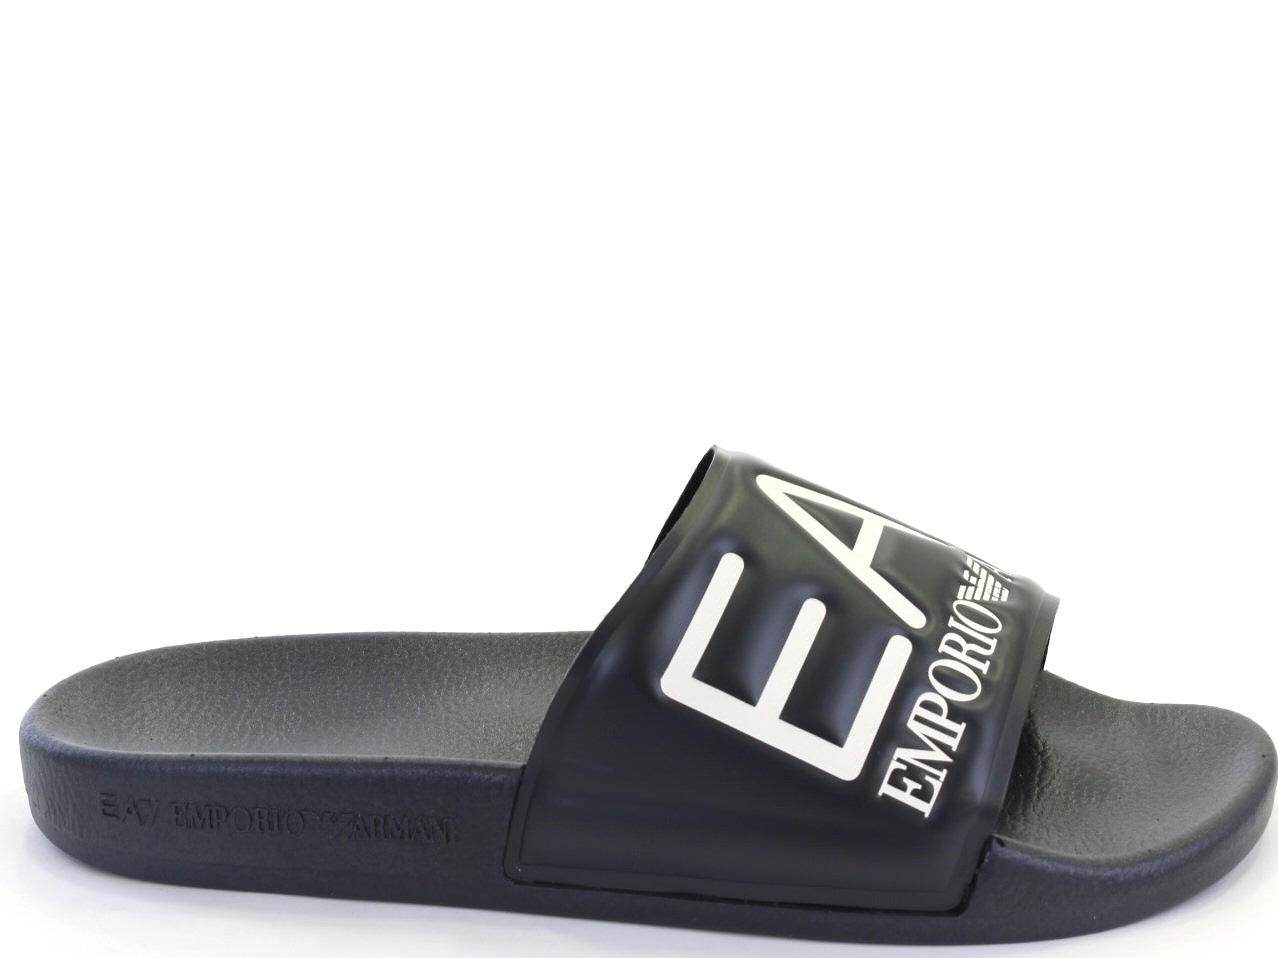 Sandálias e Chinelos Armani, Emporio - 529 XCP001 XCC22